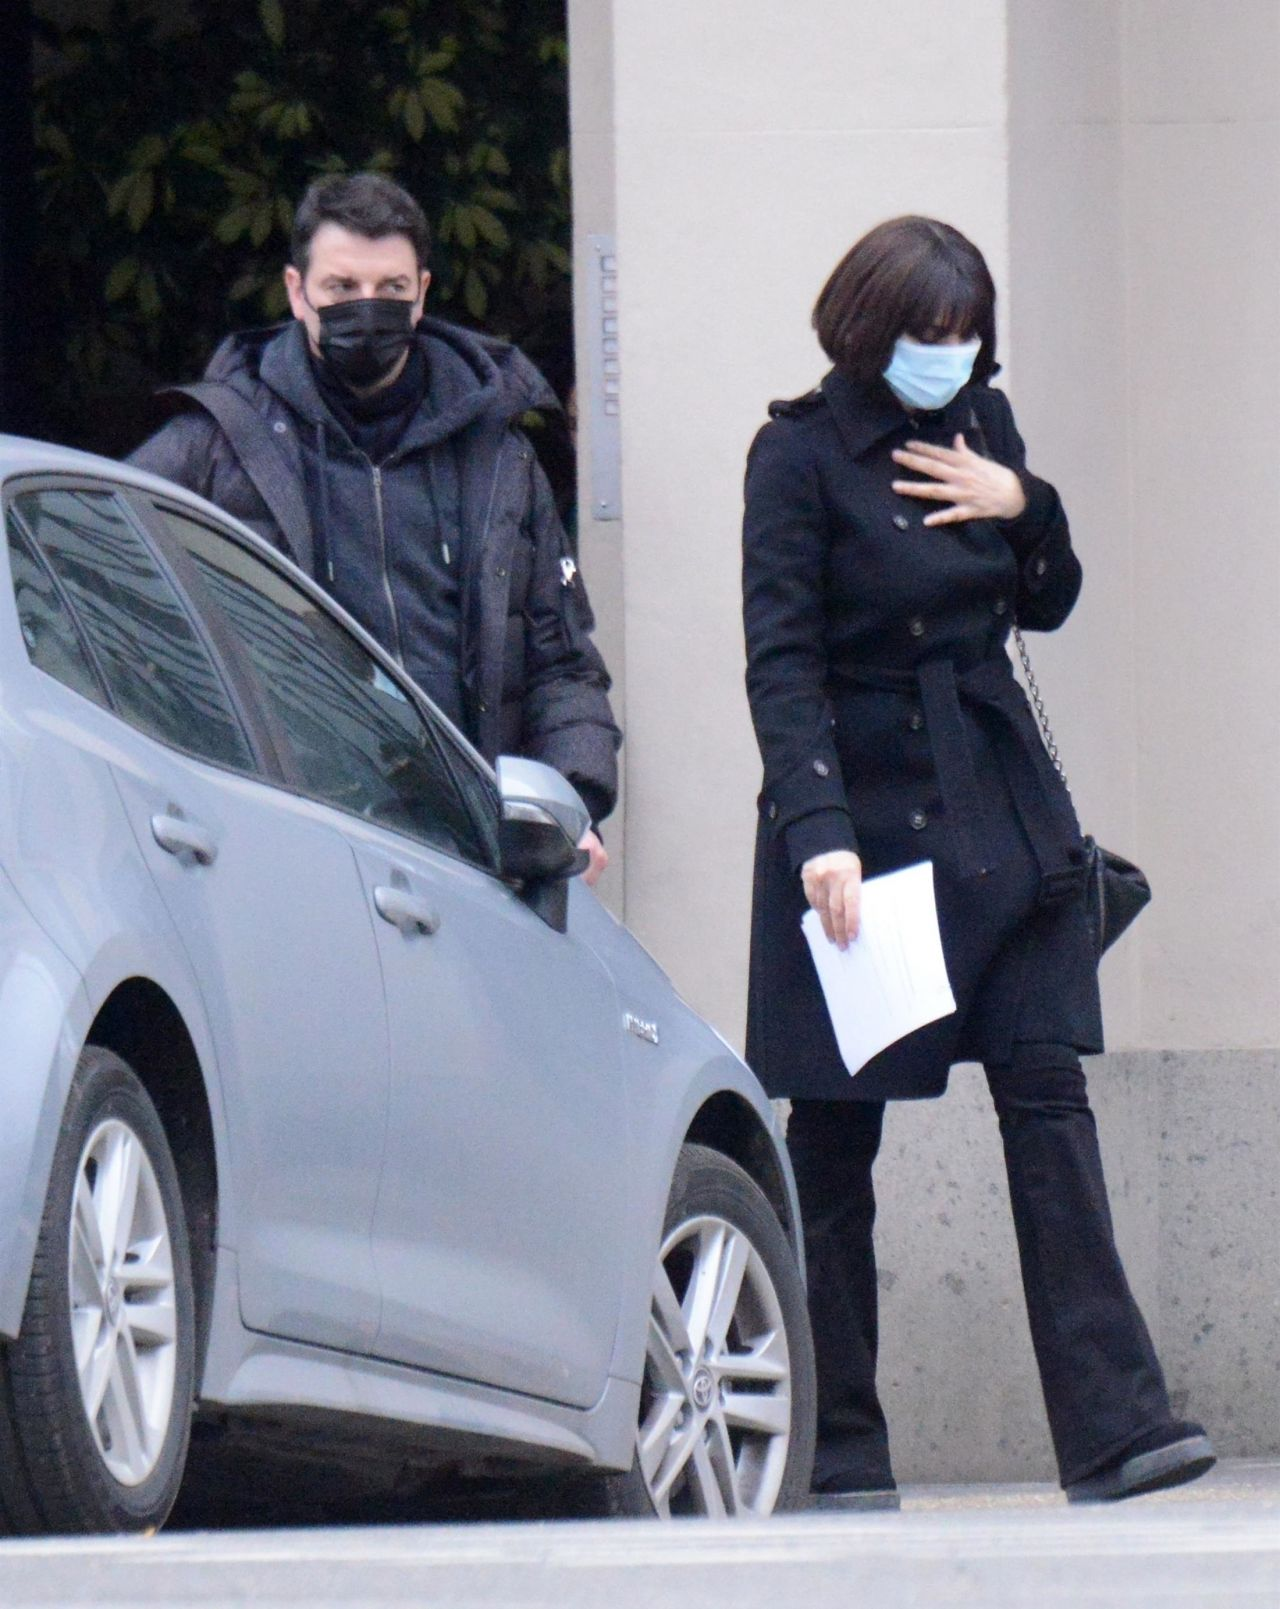 Папарацци заметили Монику Беллуччи на съёмках нового фильма